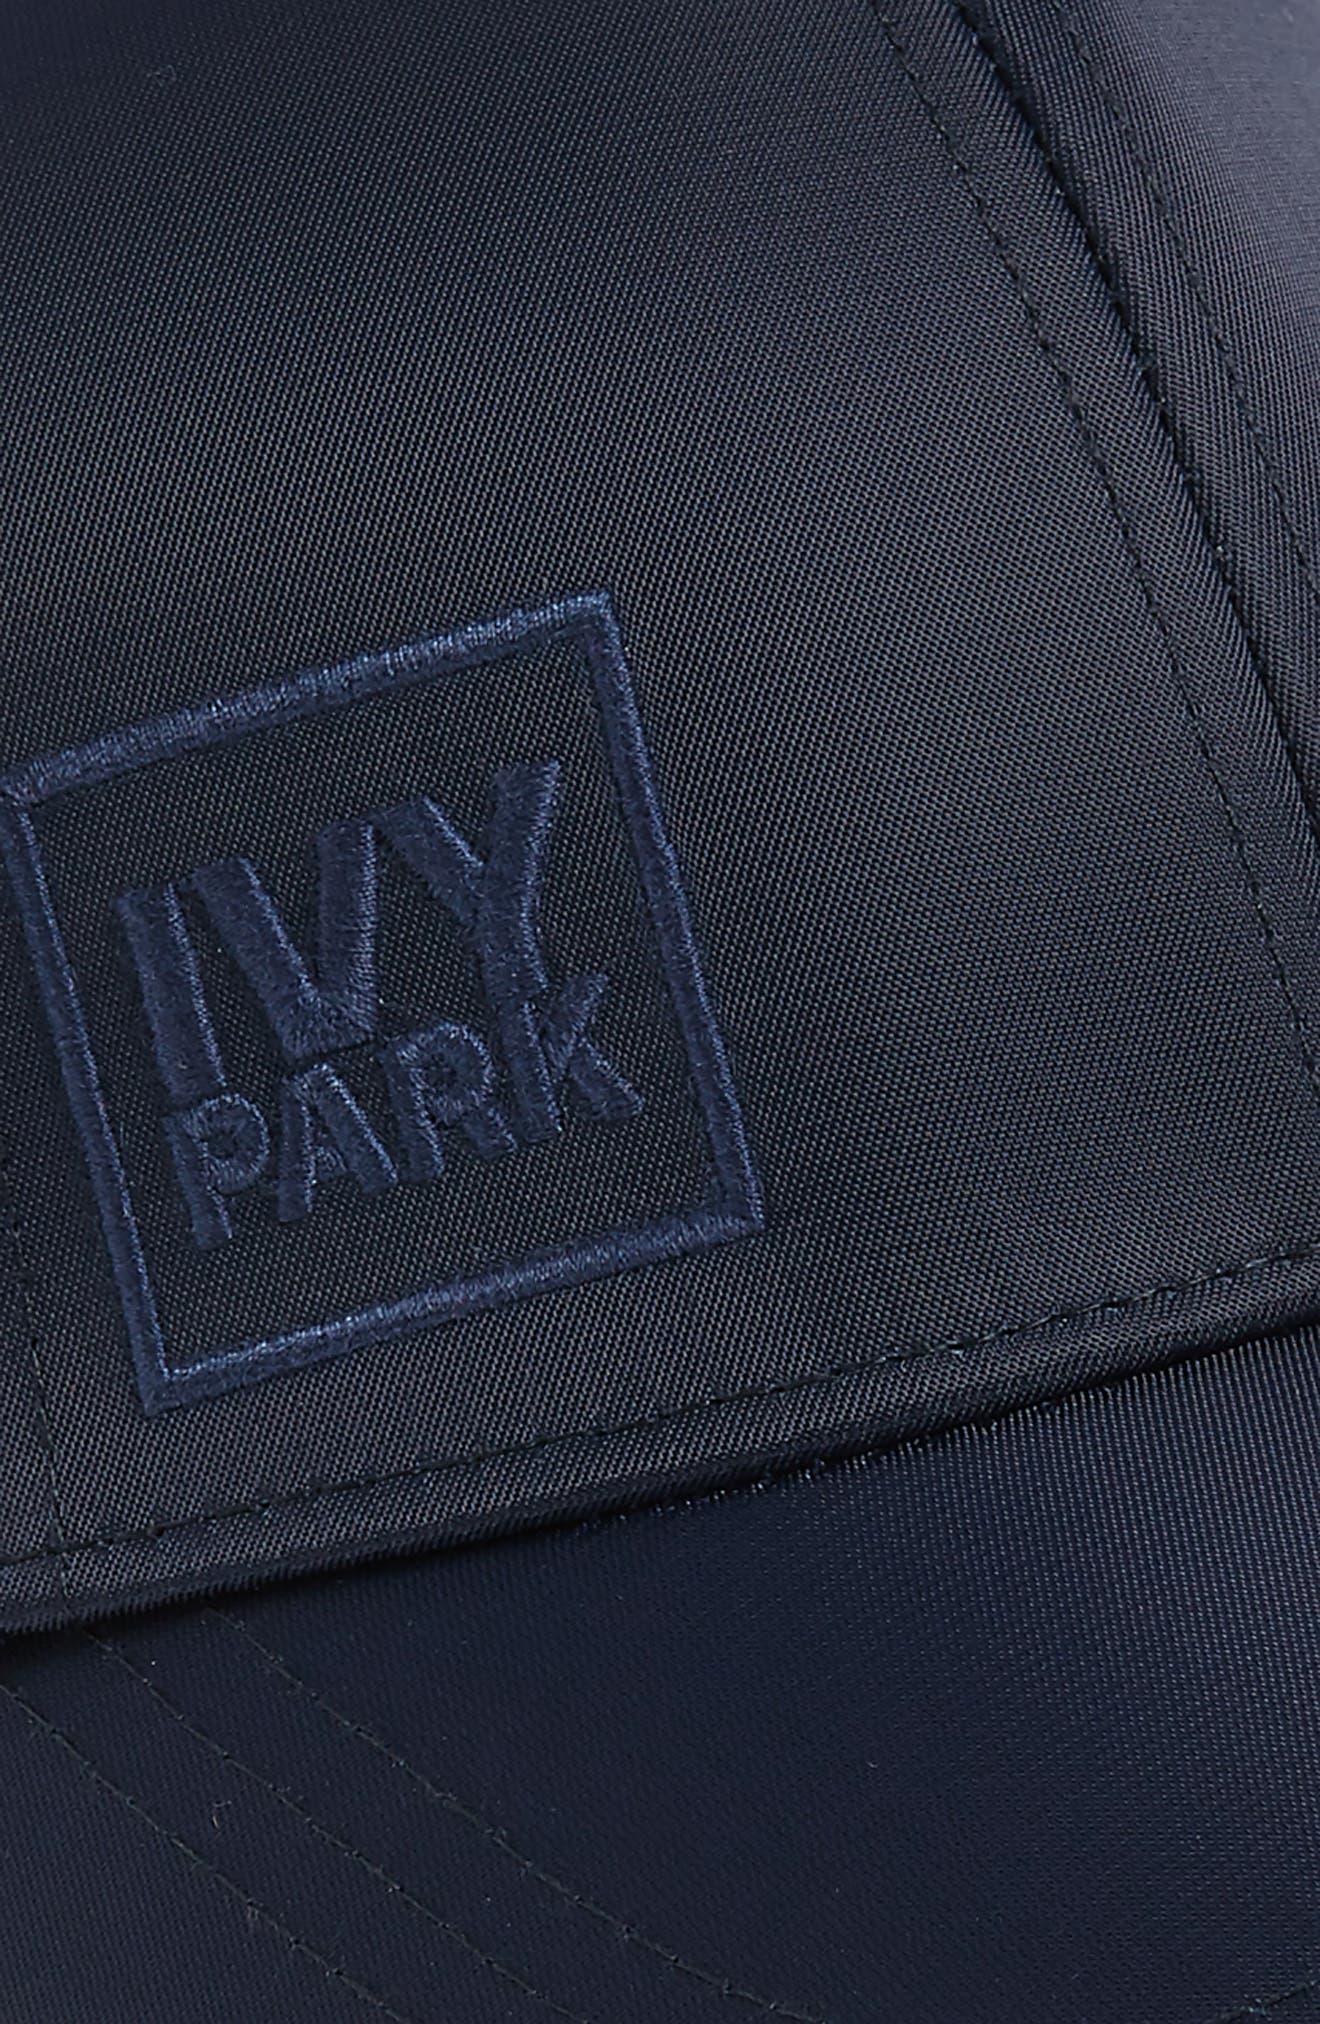 IVY PARK<SUP>®</SUP>,                             High Shine Backless Cap,                             Alternate thumbnail 3, color,                             400